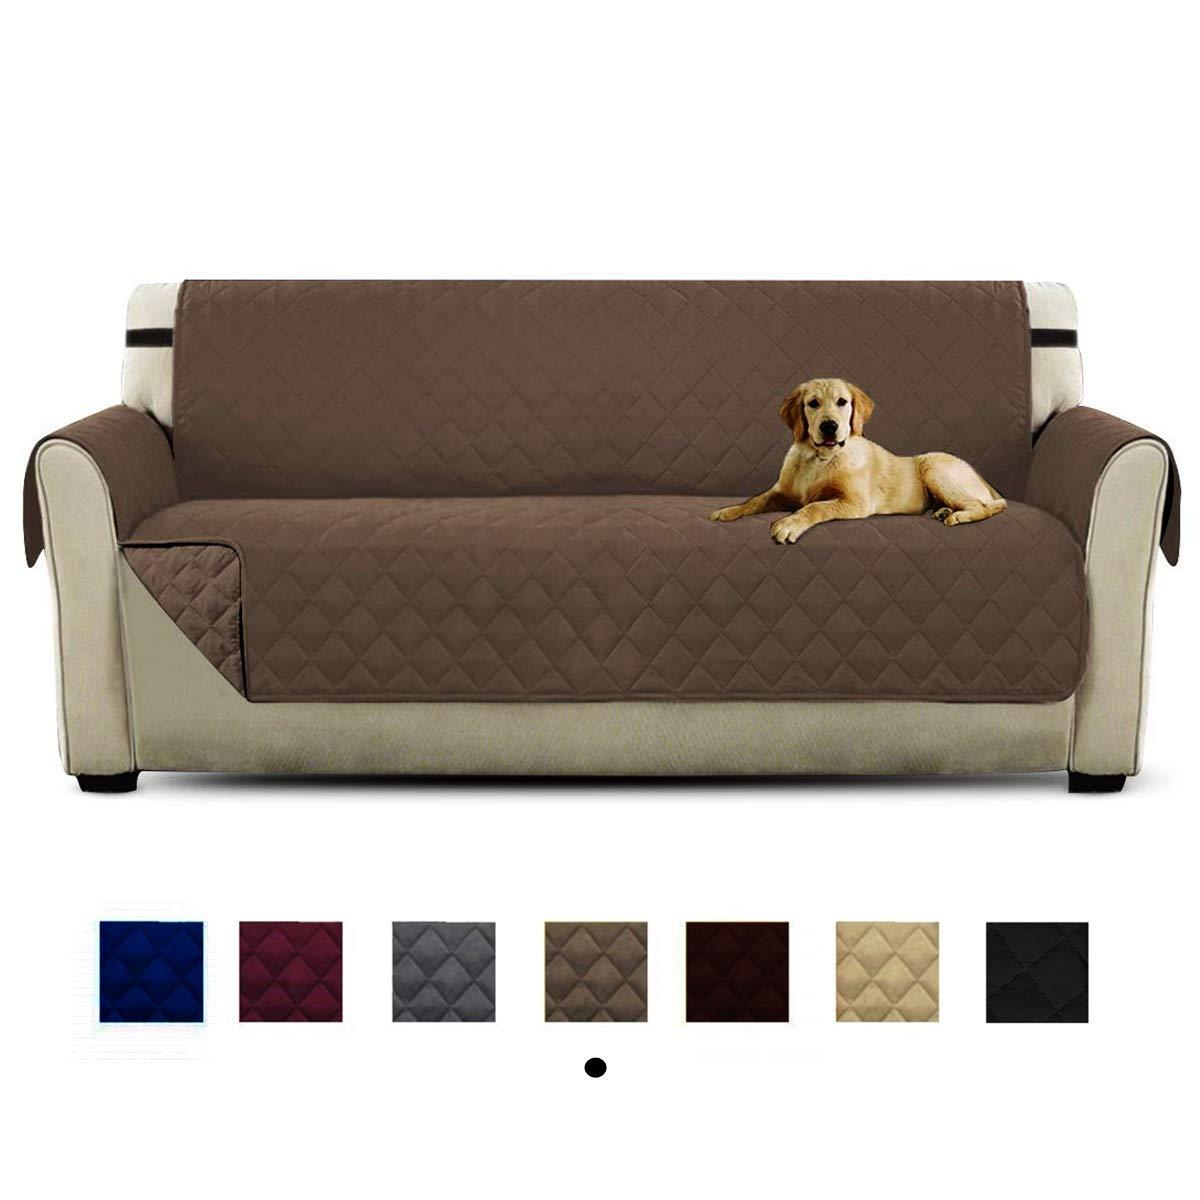 Anti-Sucio para Mascotas Protector de Sof/á Muebles HONCENMAX Funda Cubre Sof/á 3 Plazas 110X 75 Protector para Sof/ás Acolchado